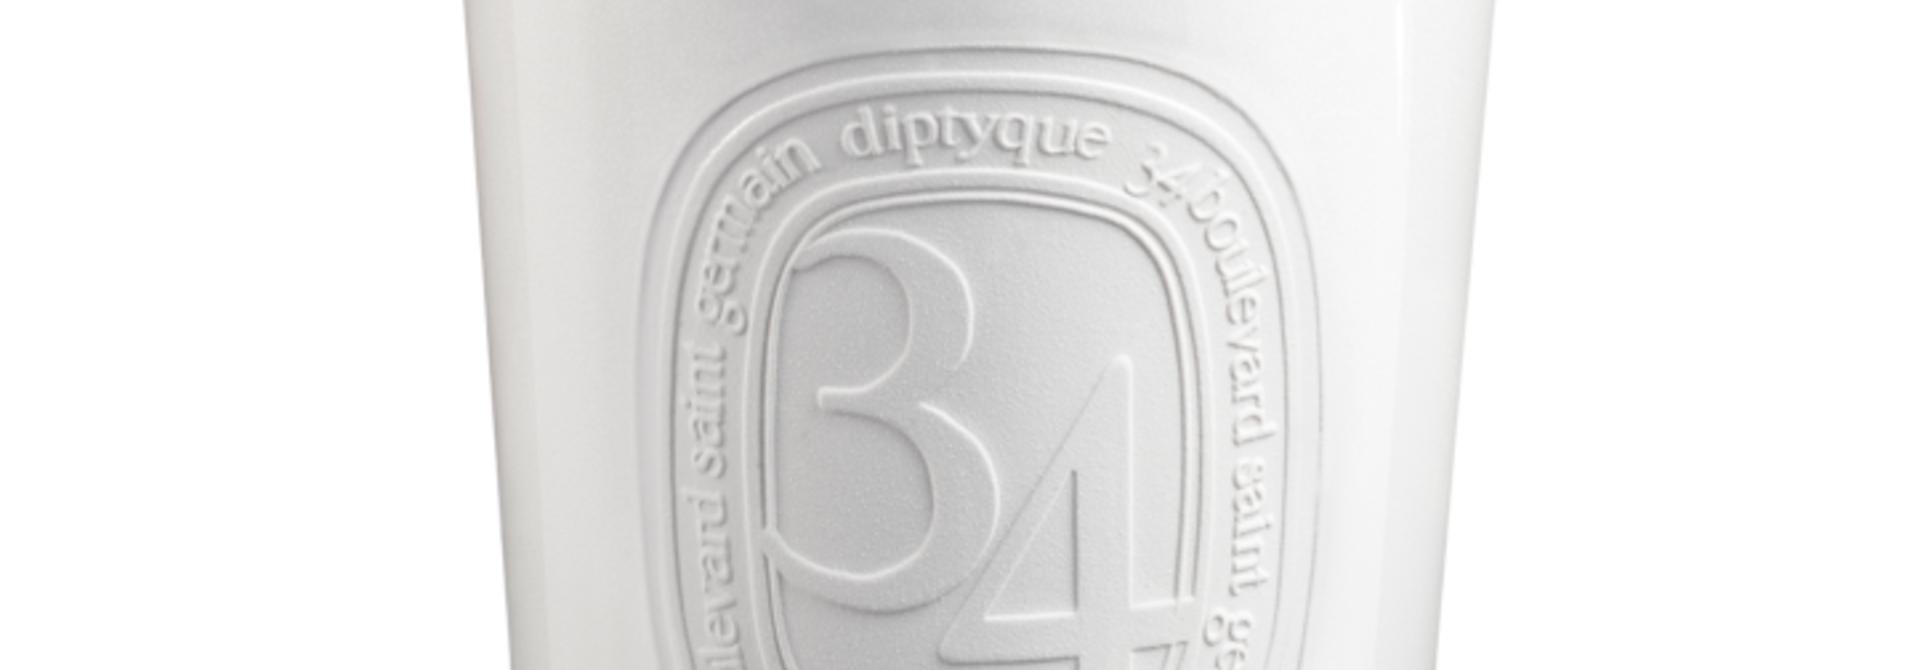 DIPTYQUE - Candle 34 Boulevard Saint Germain 1500gr